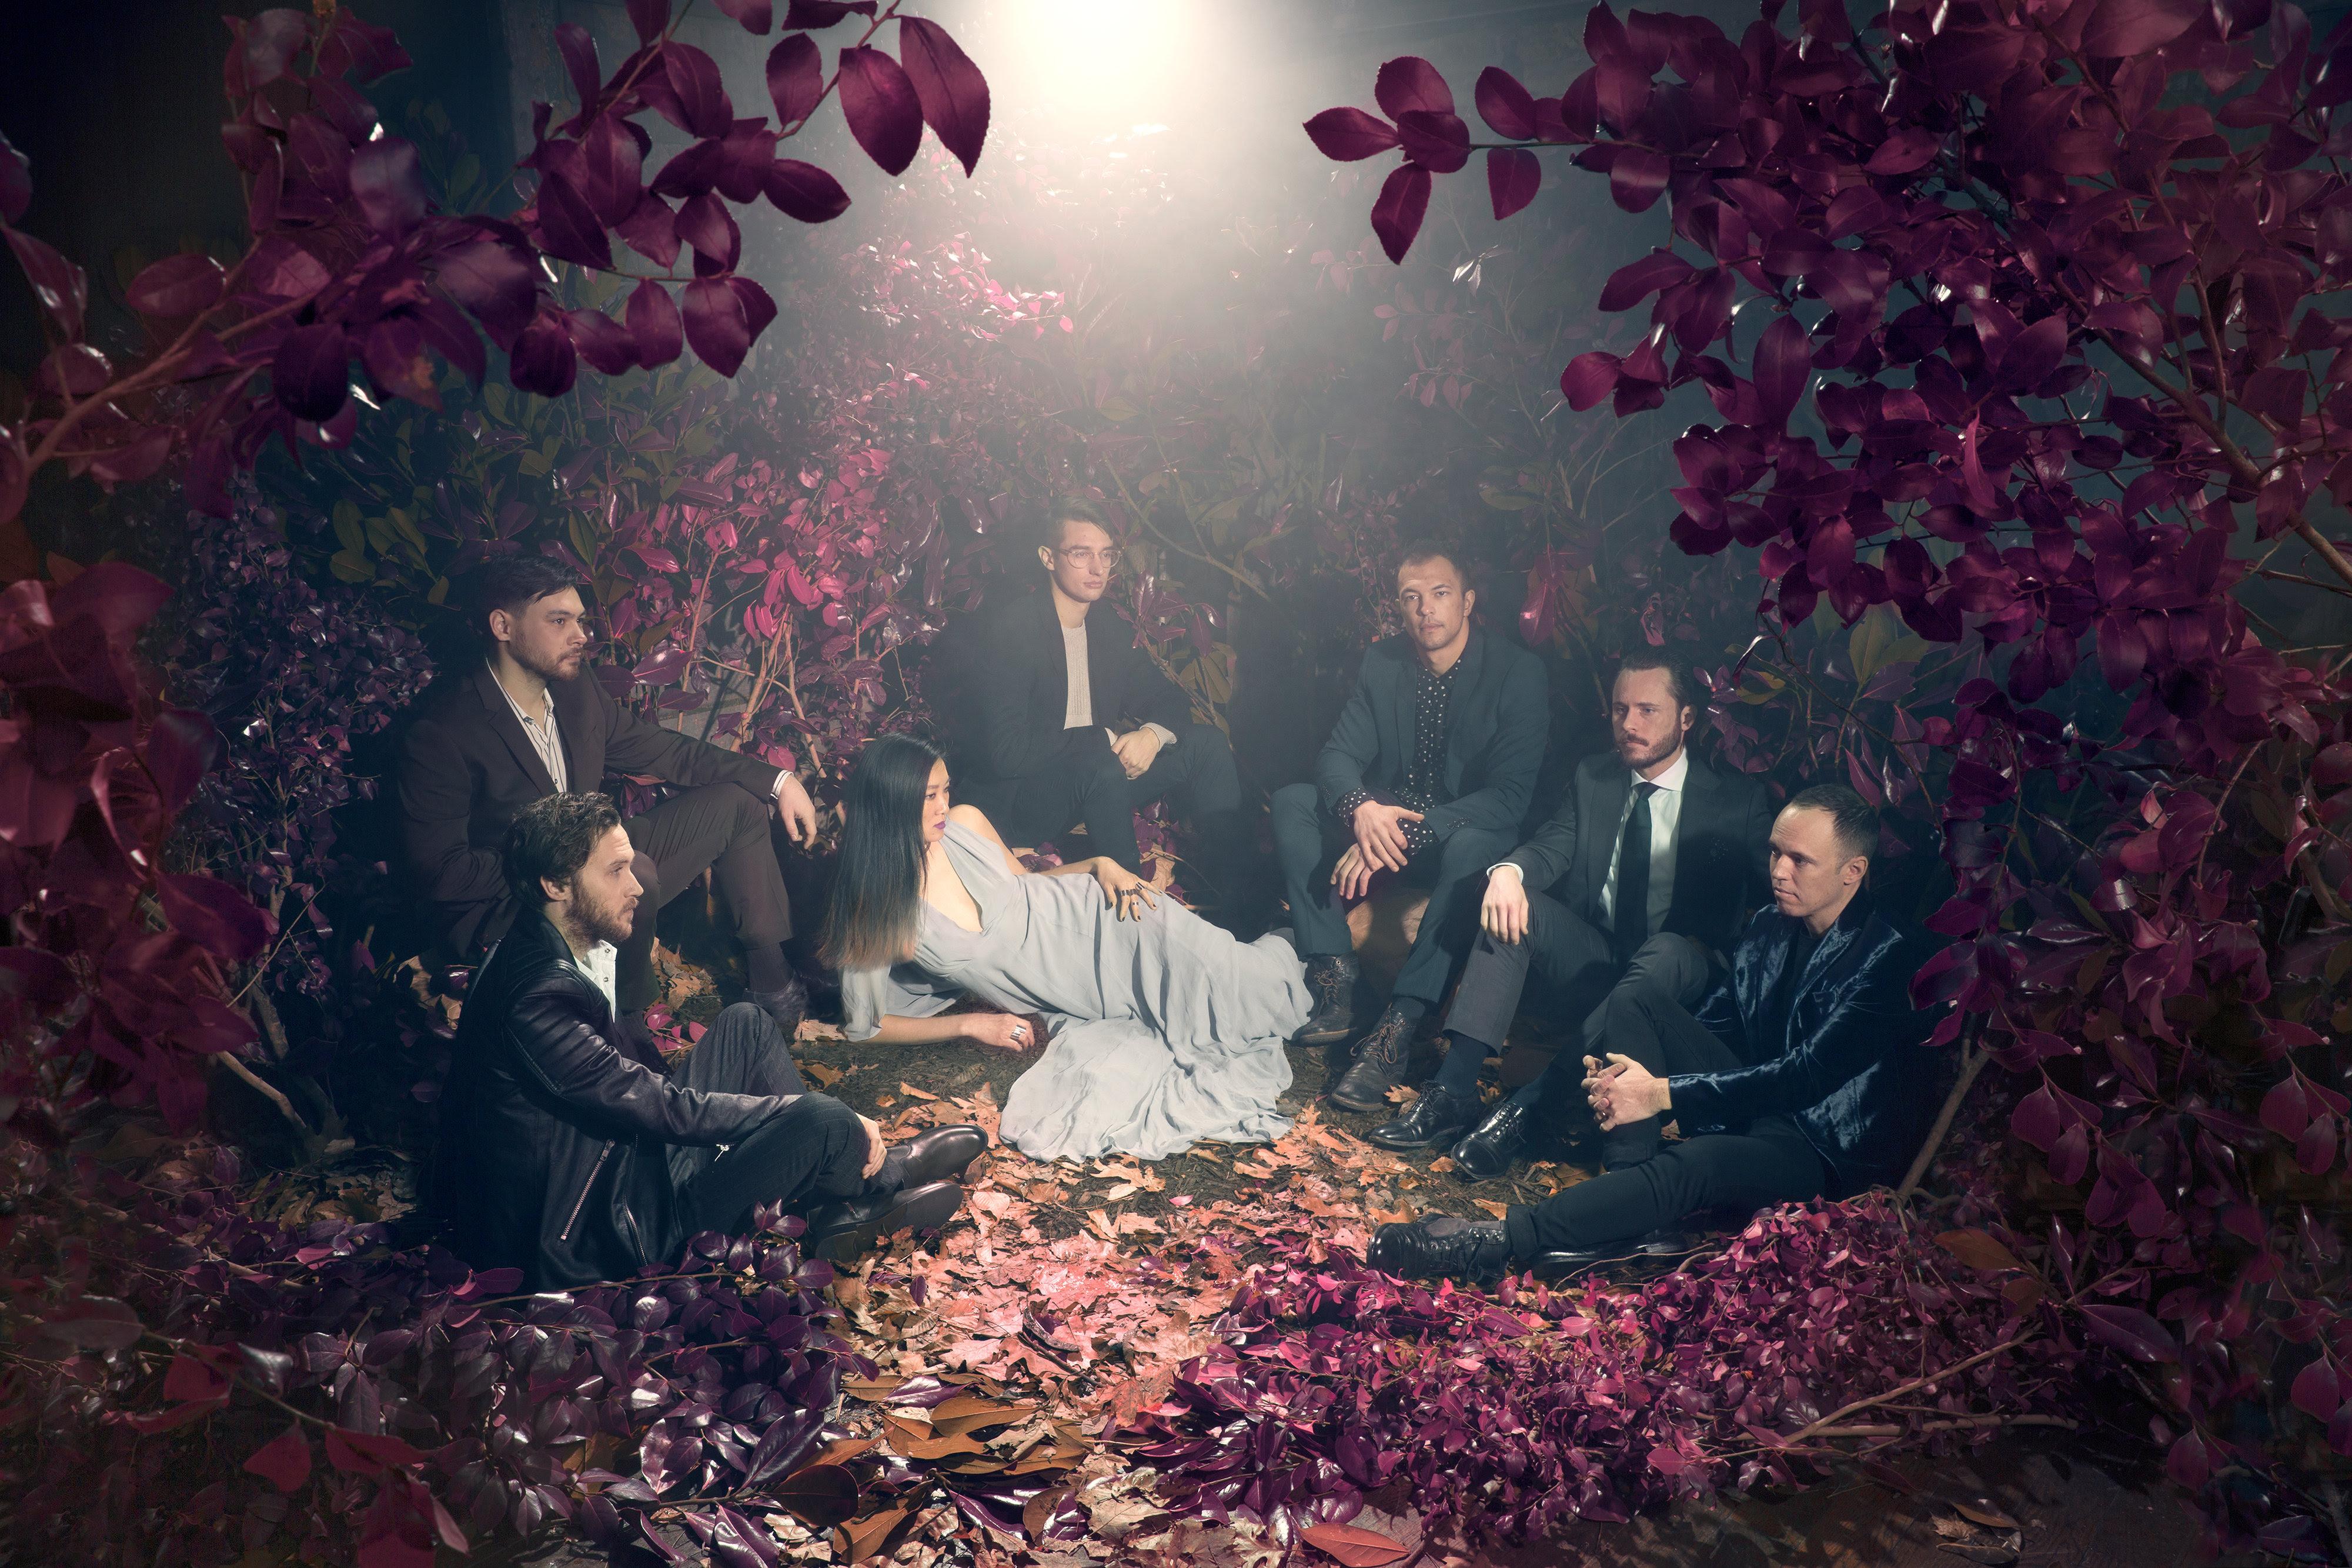 San Fermin share title track from new album 'Belong'